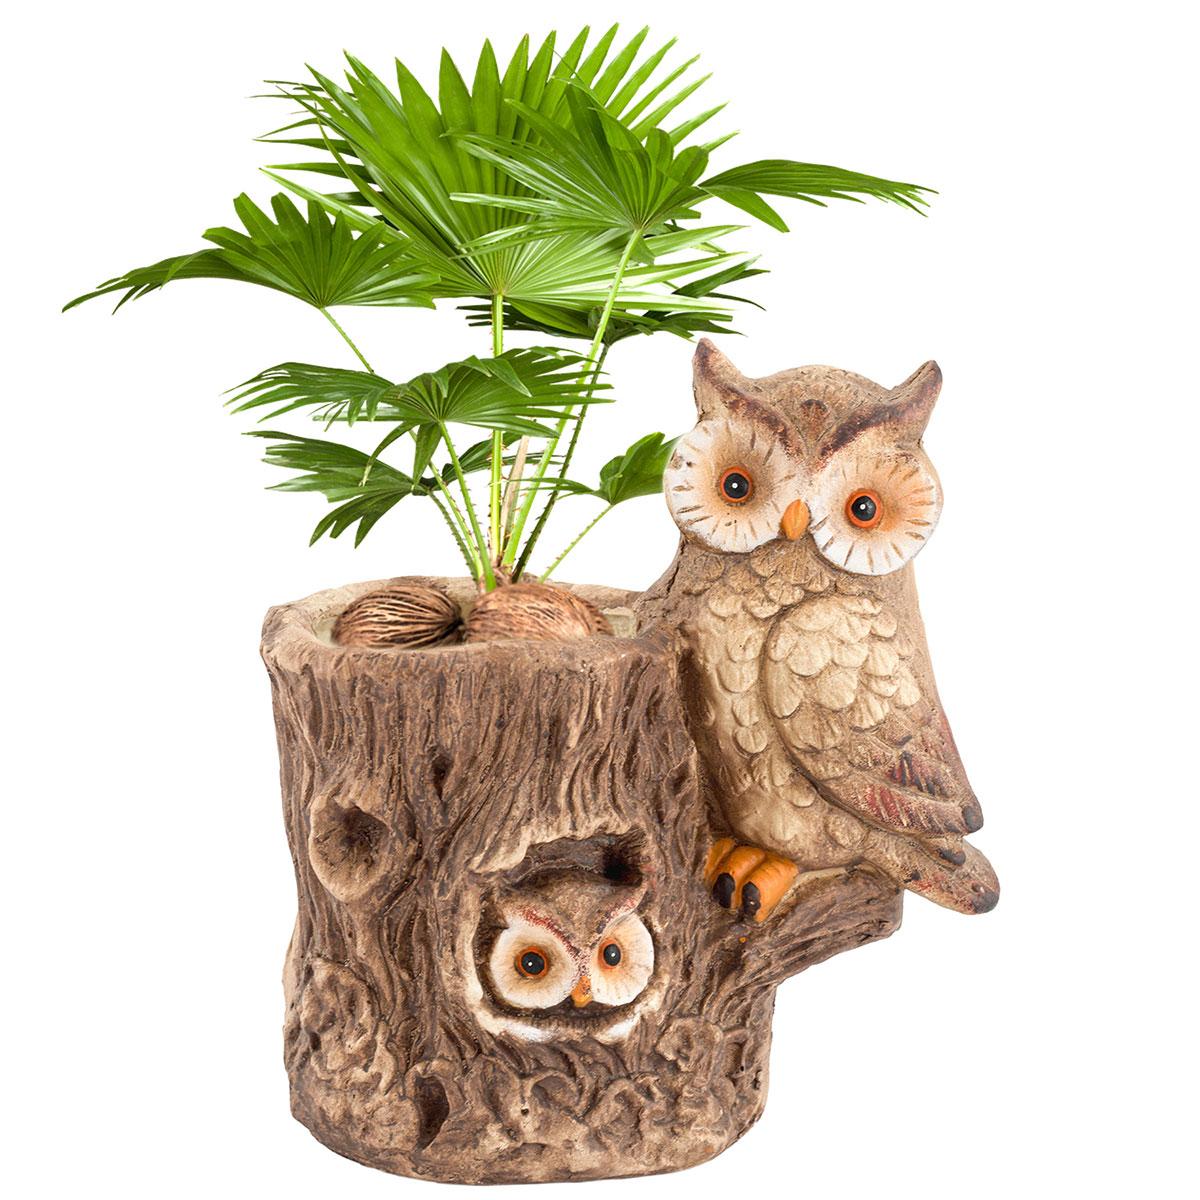 Sehr Gut art decor Pflanzgefäß Eule am Baum, Pflanzfigur, Pflanztopf, Höhe  PA32